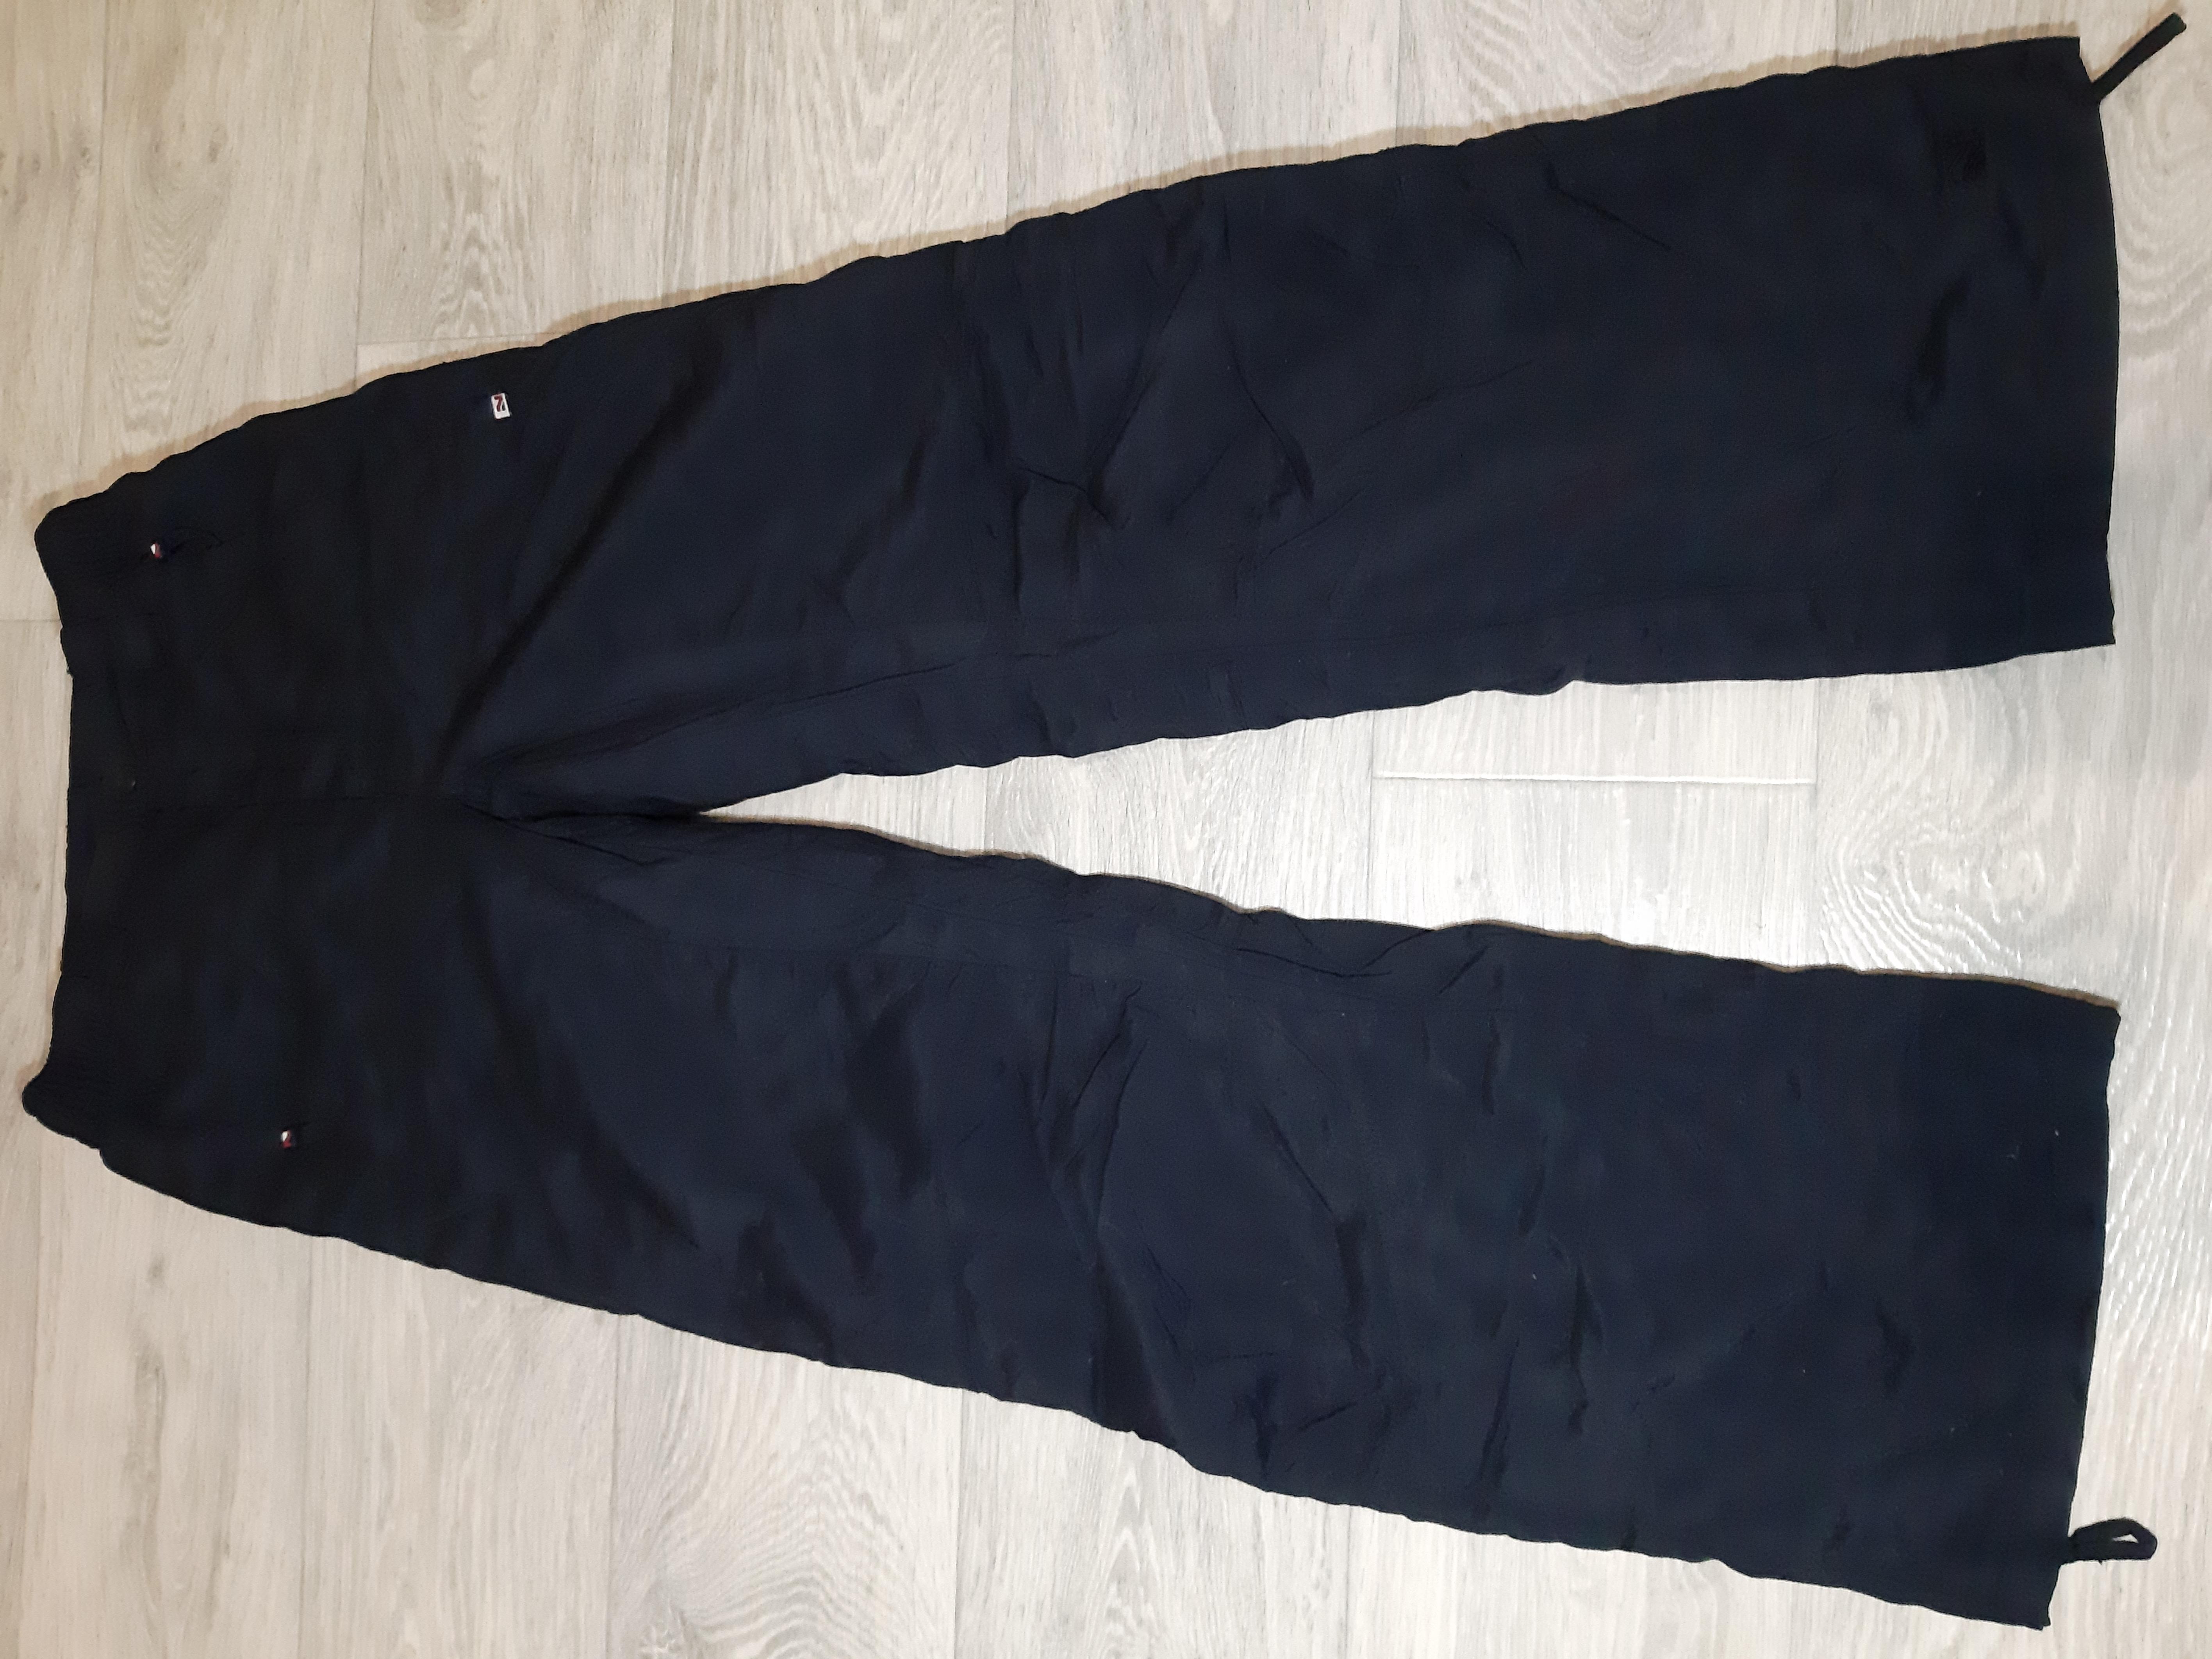 Термо штаны на мальчика,фирмы Northbrook,на рост 152